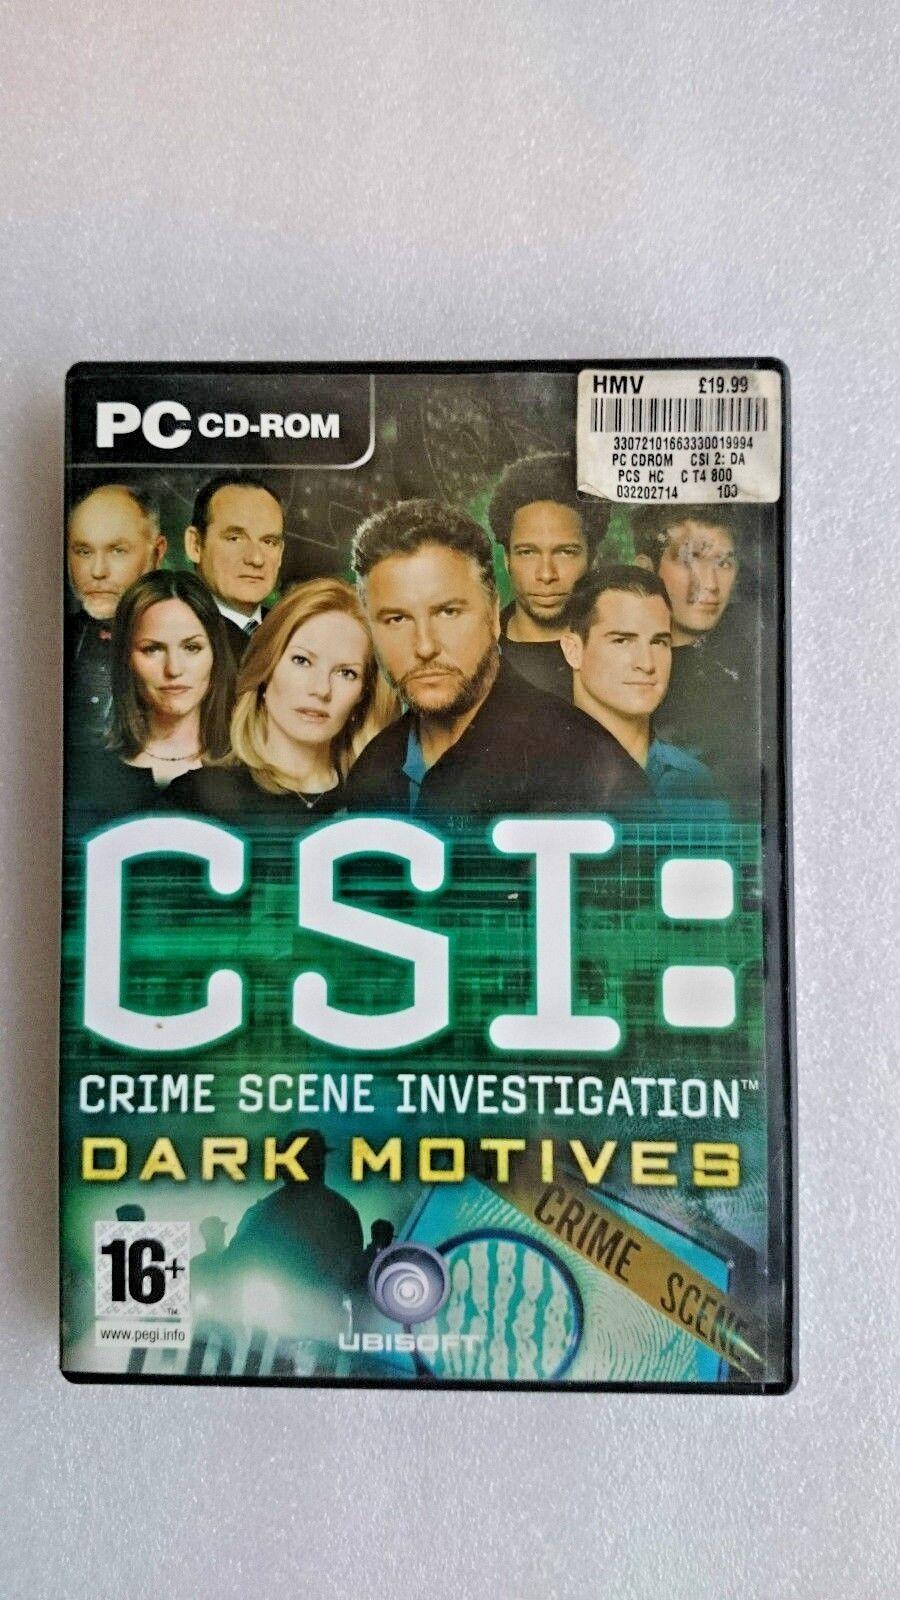 CSI: Crime Scene Investigation: Dark Motives (PC: Windows, 2005)